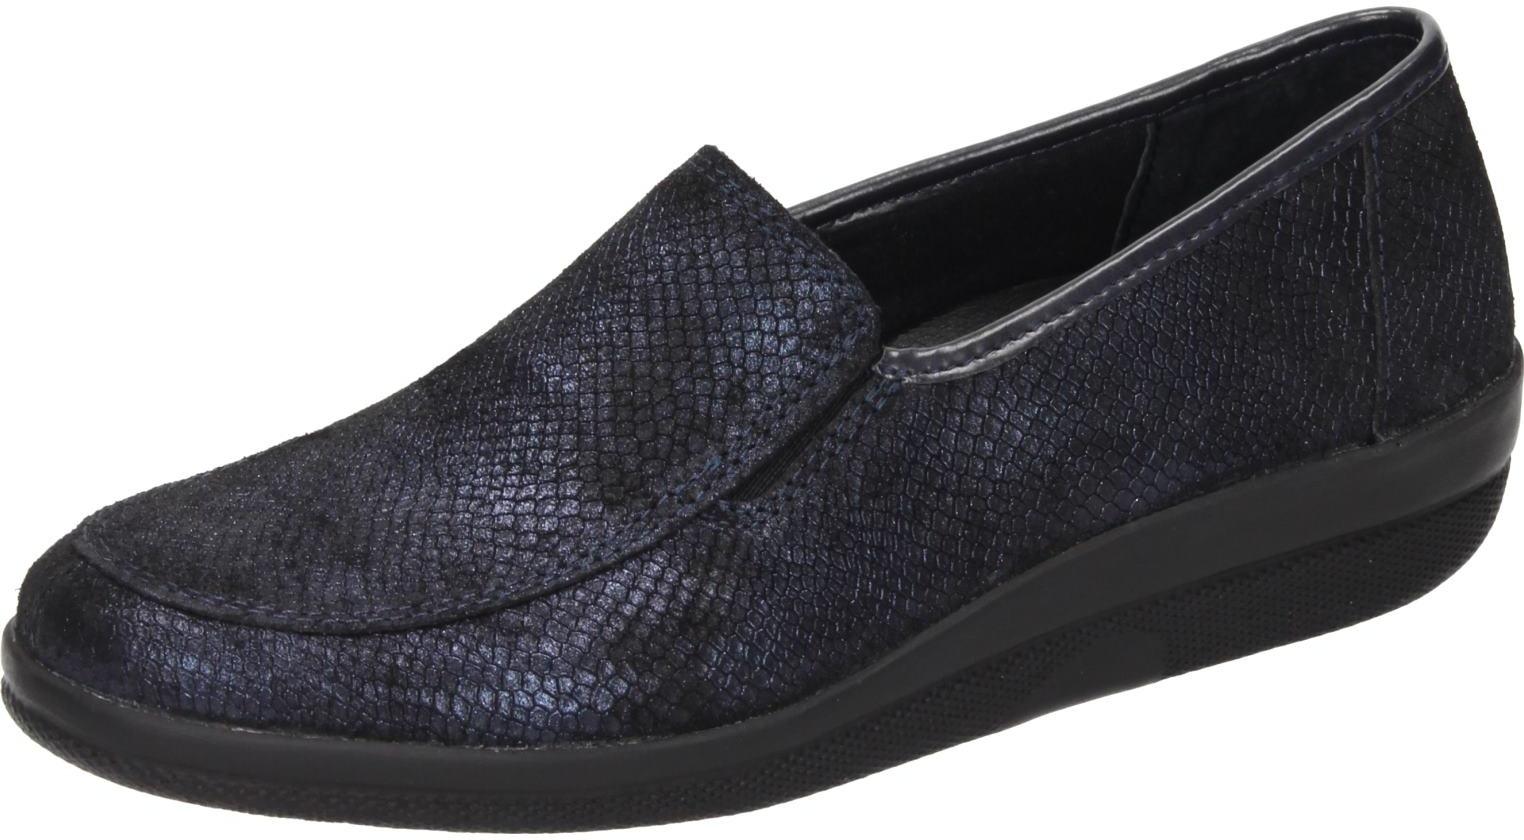 Comfortabel Damen Schuhe Damen-Slipper - G blau Geprägtes Leder 942335